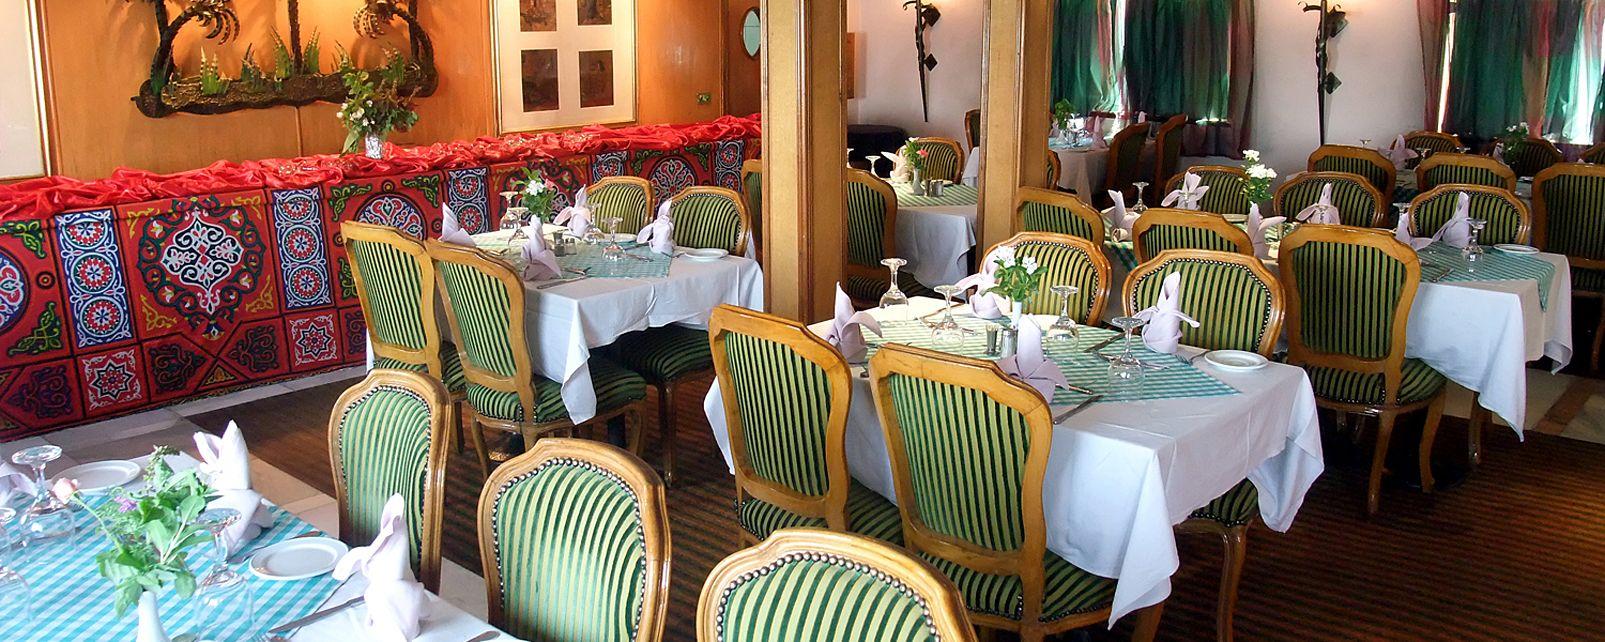 Hotel Bateau Nile Star